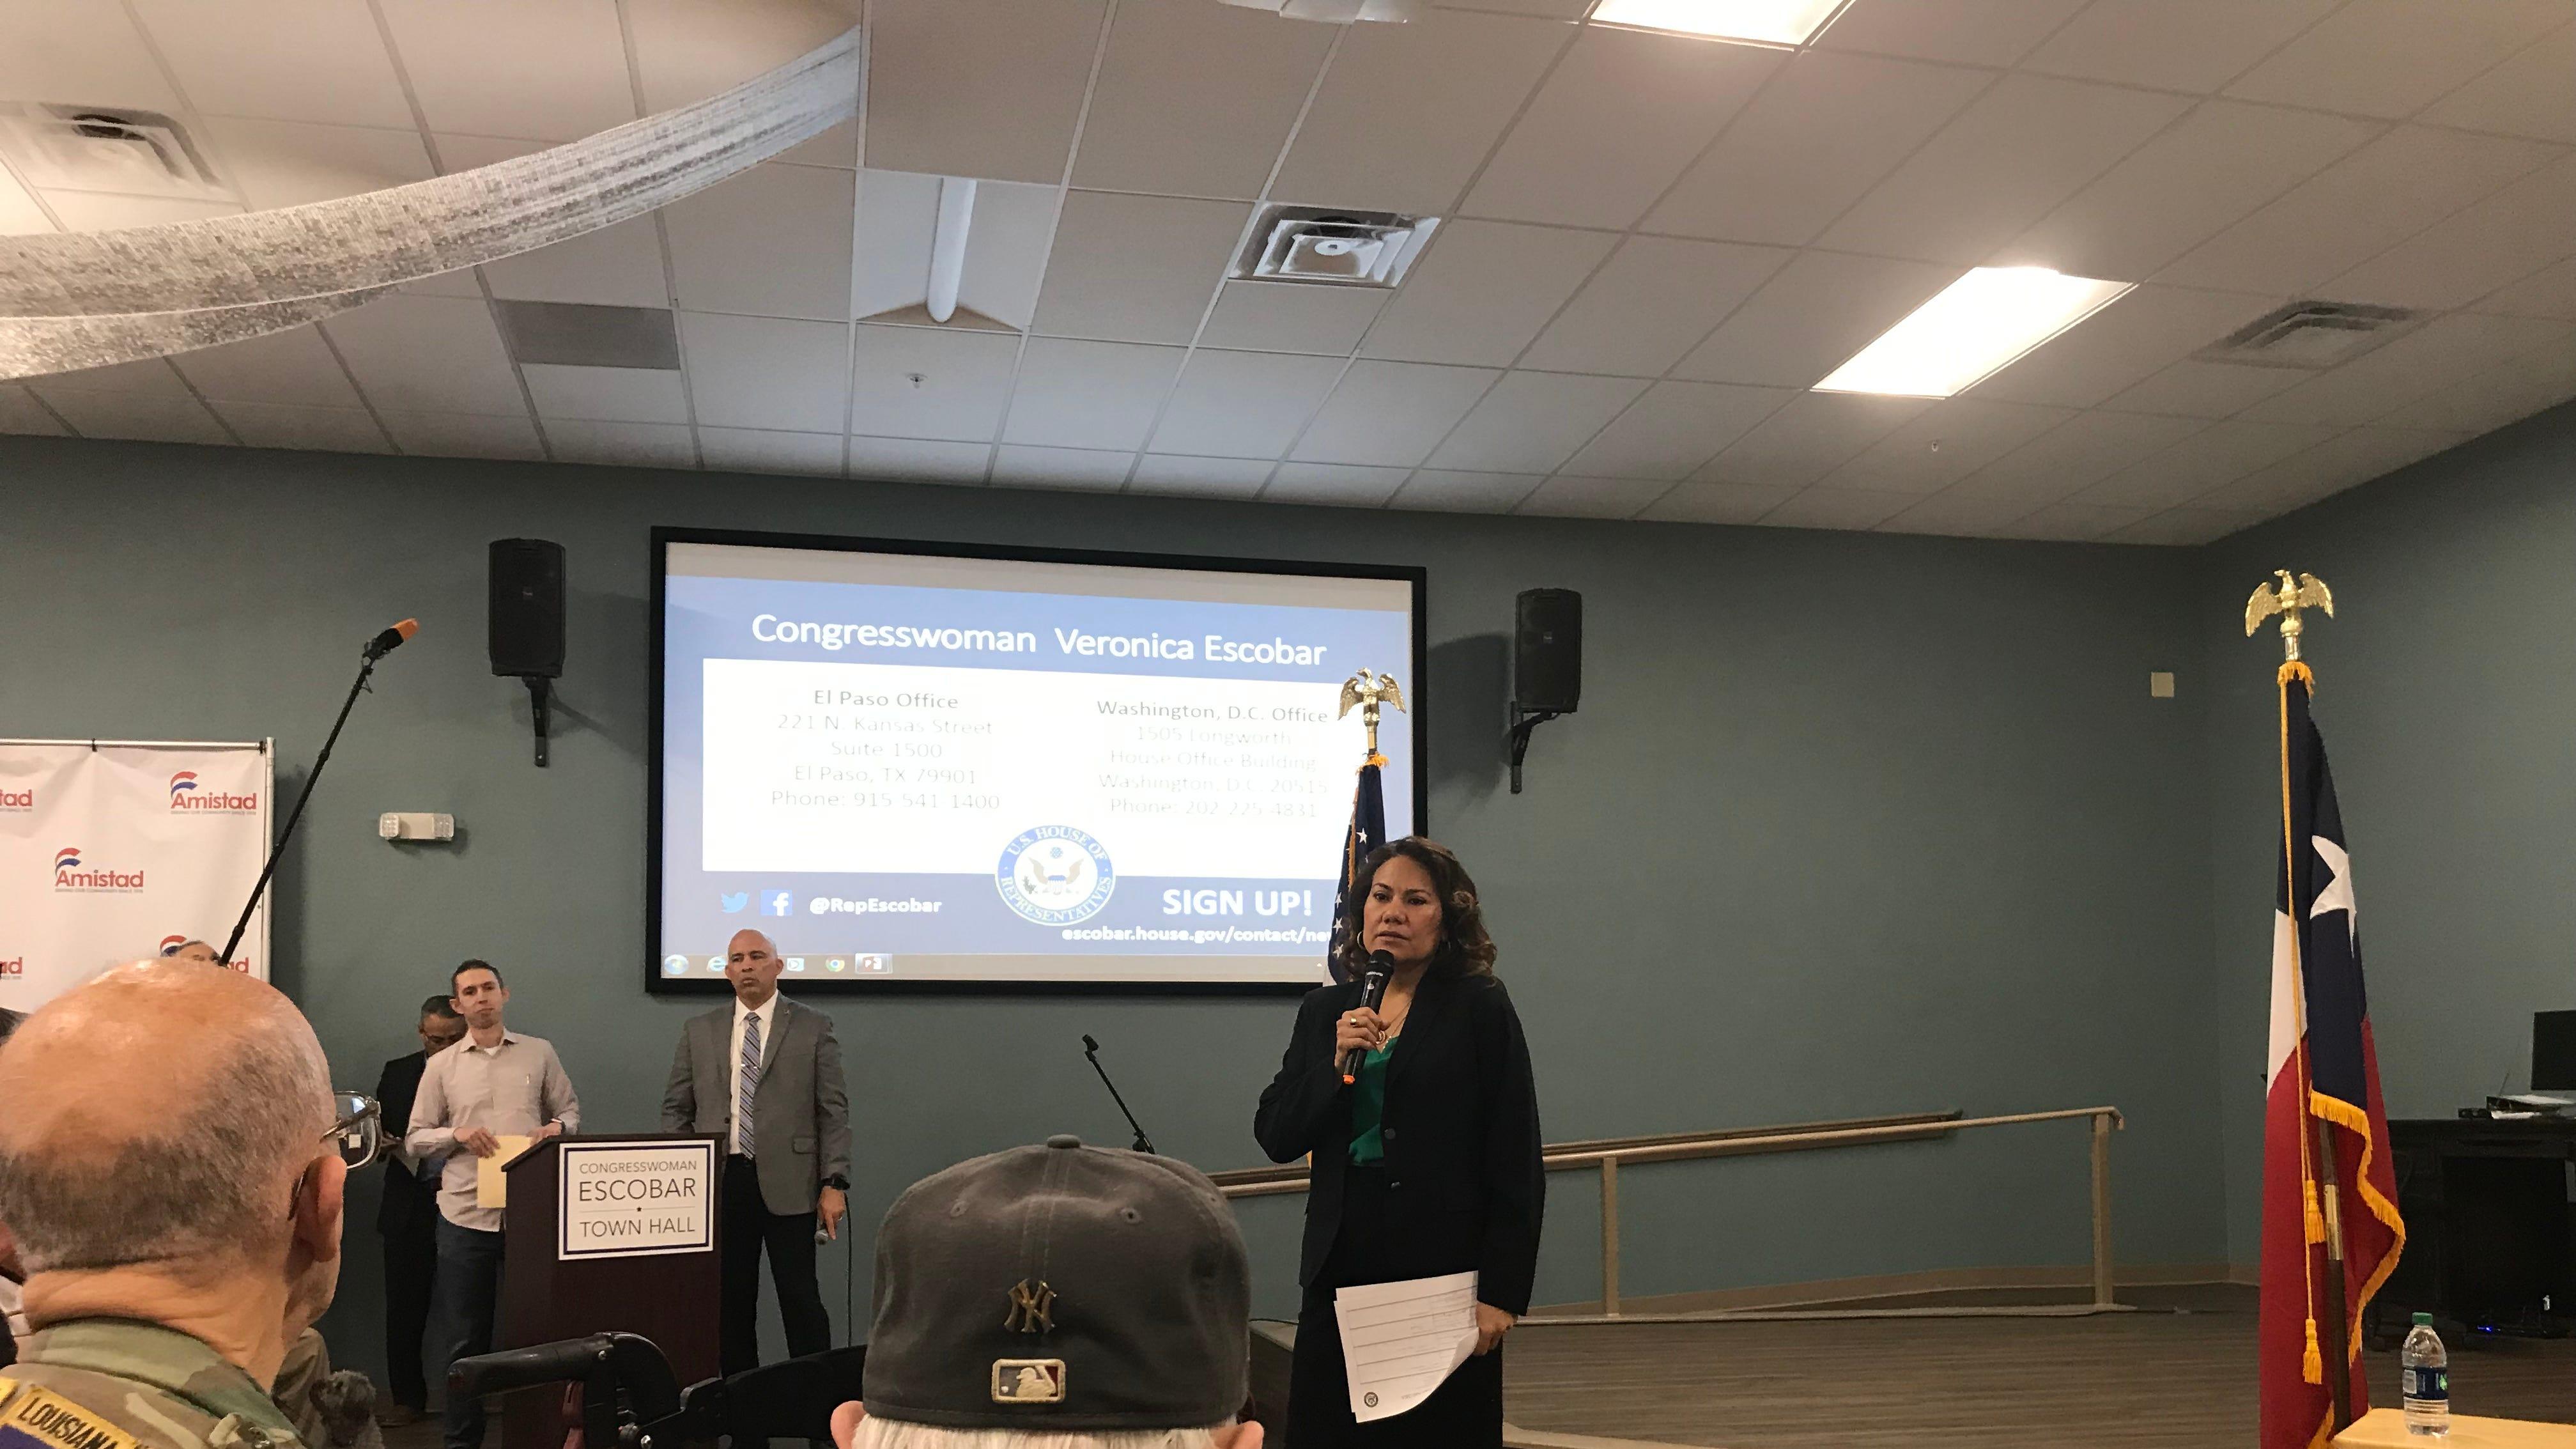 US Rep. Veronica Escobar discusses Heather Wilson, immigration, gun control at town hall